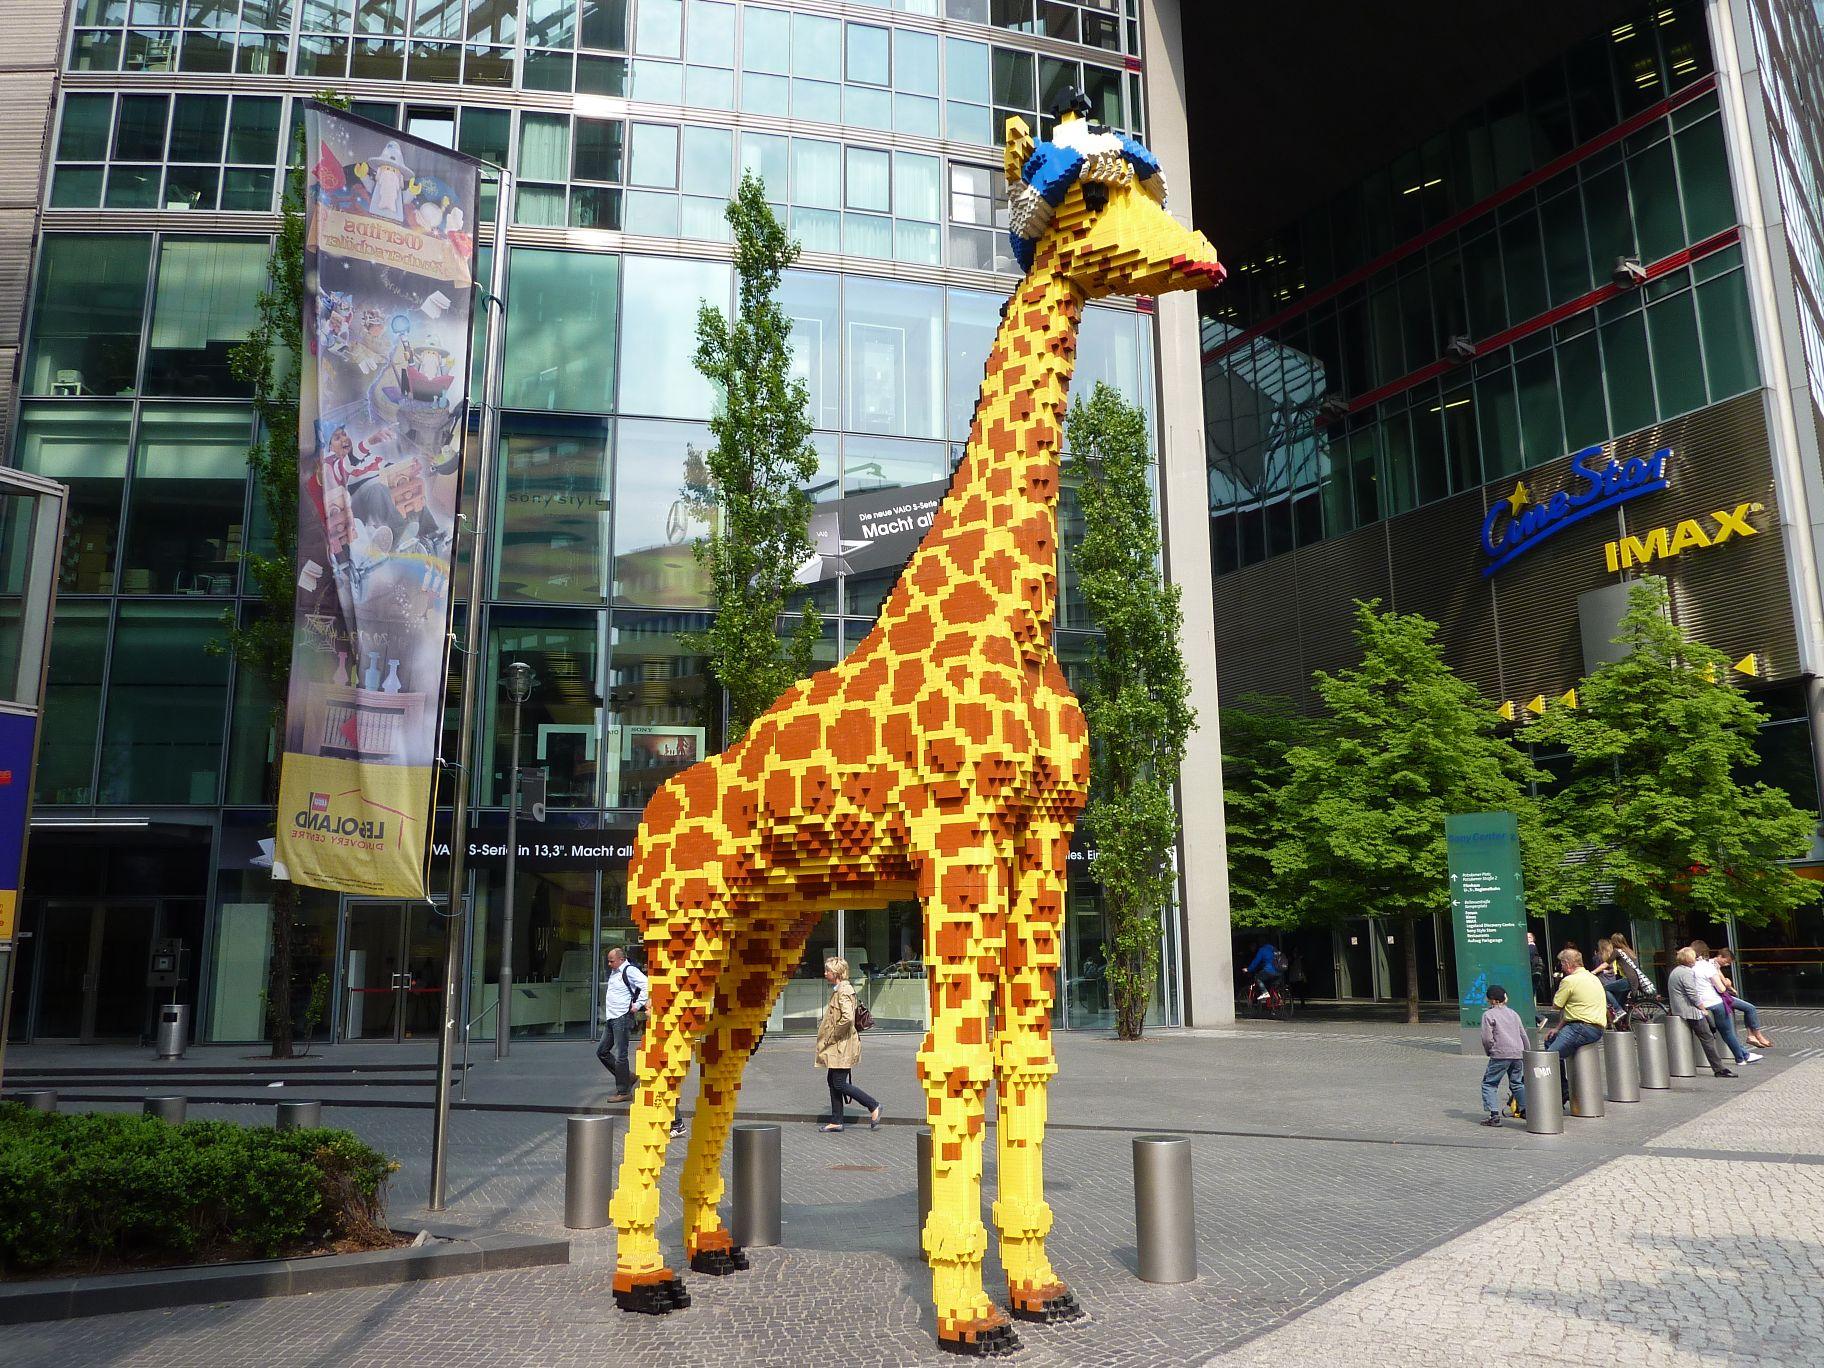 lego giraffe legoland discovery center berlin. Black Bedroom Furniture Sets. Home Design Ideas